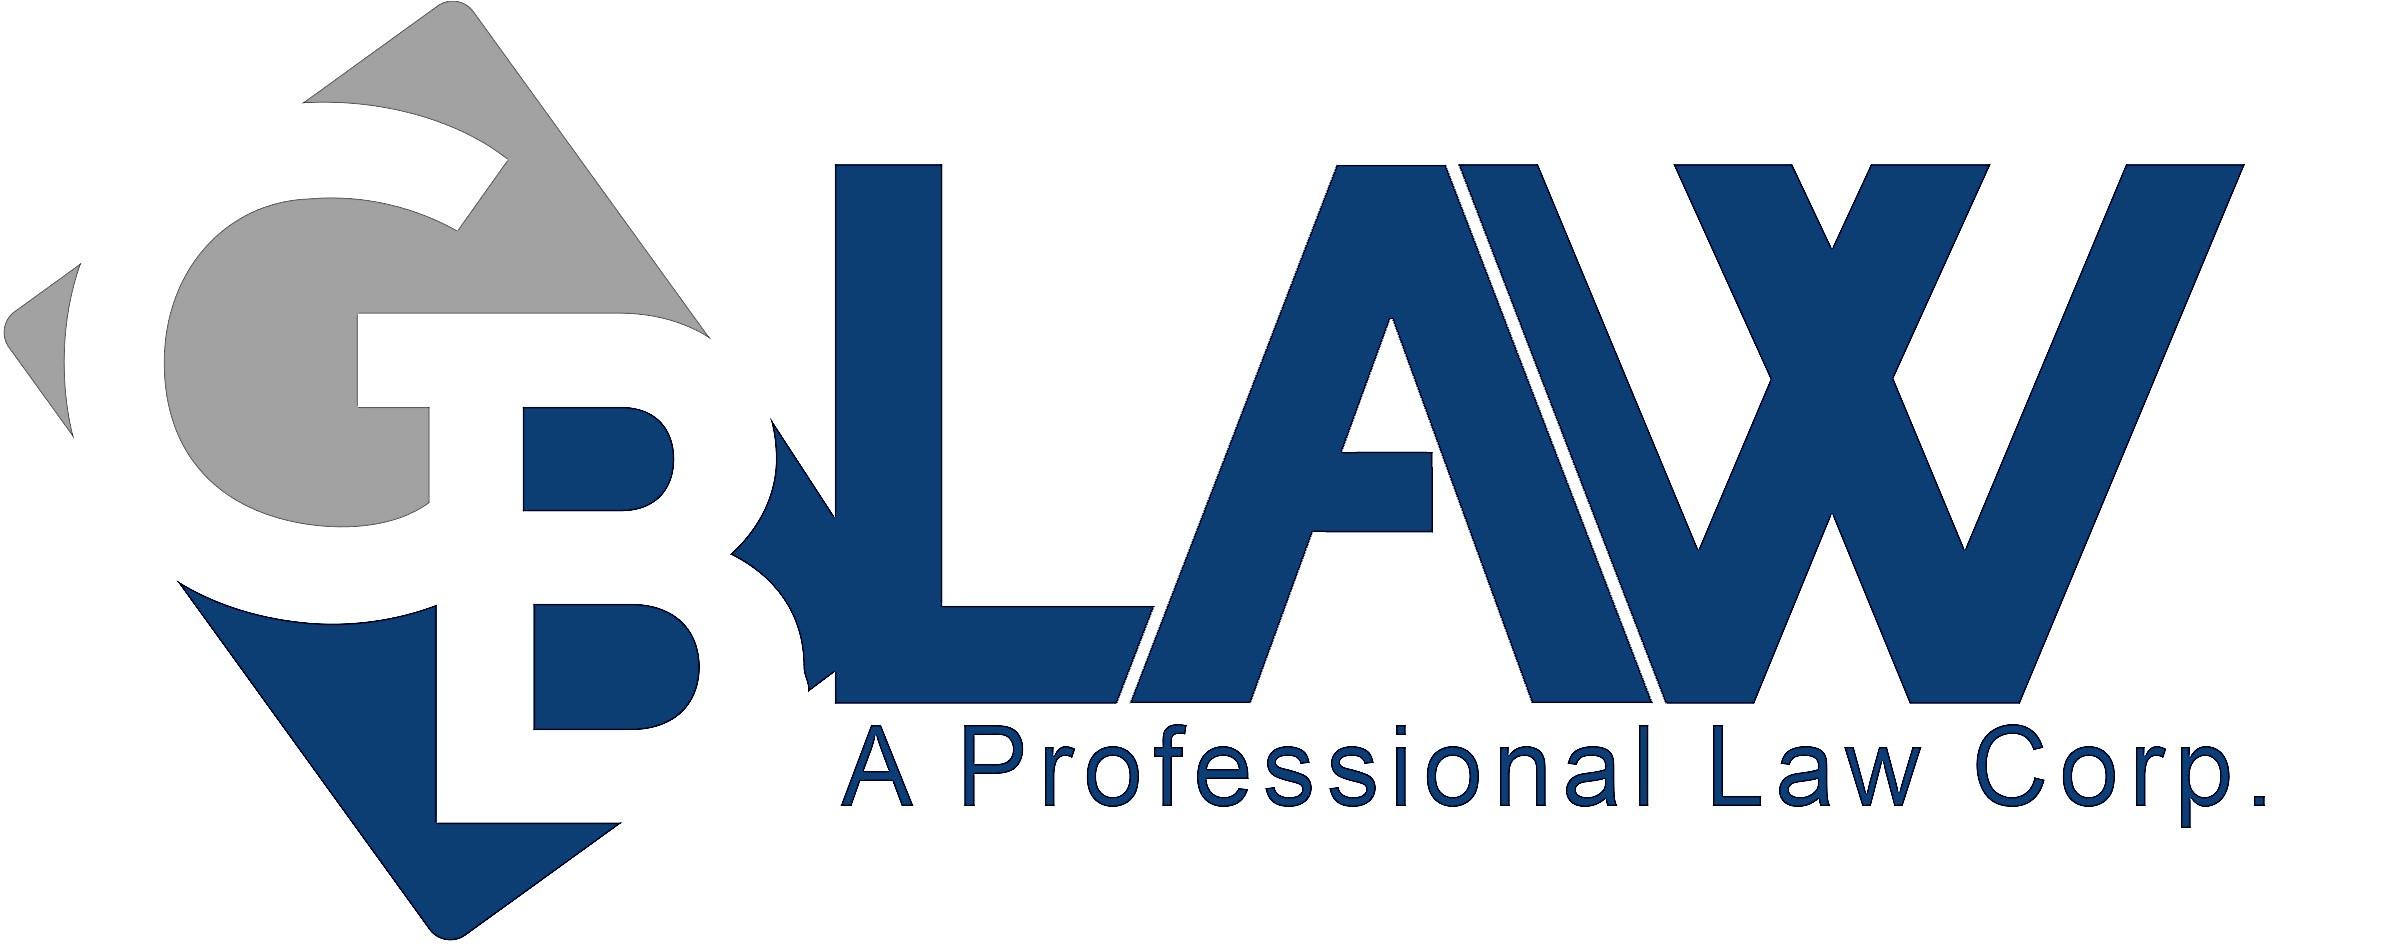 Law Offices Of Gary Berkovich Reviews, Ratings   Personal Injury Law near 14900 Ventura Blvd , Sherman Oaks CA